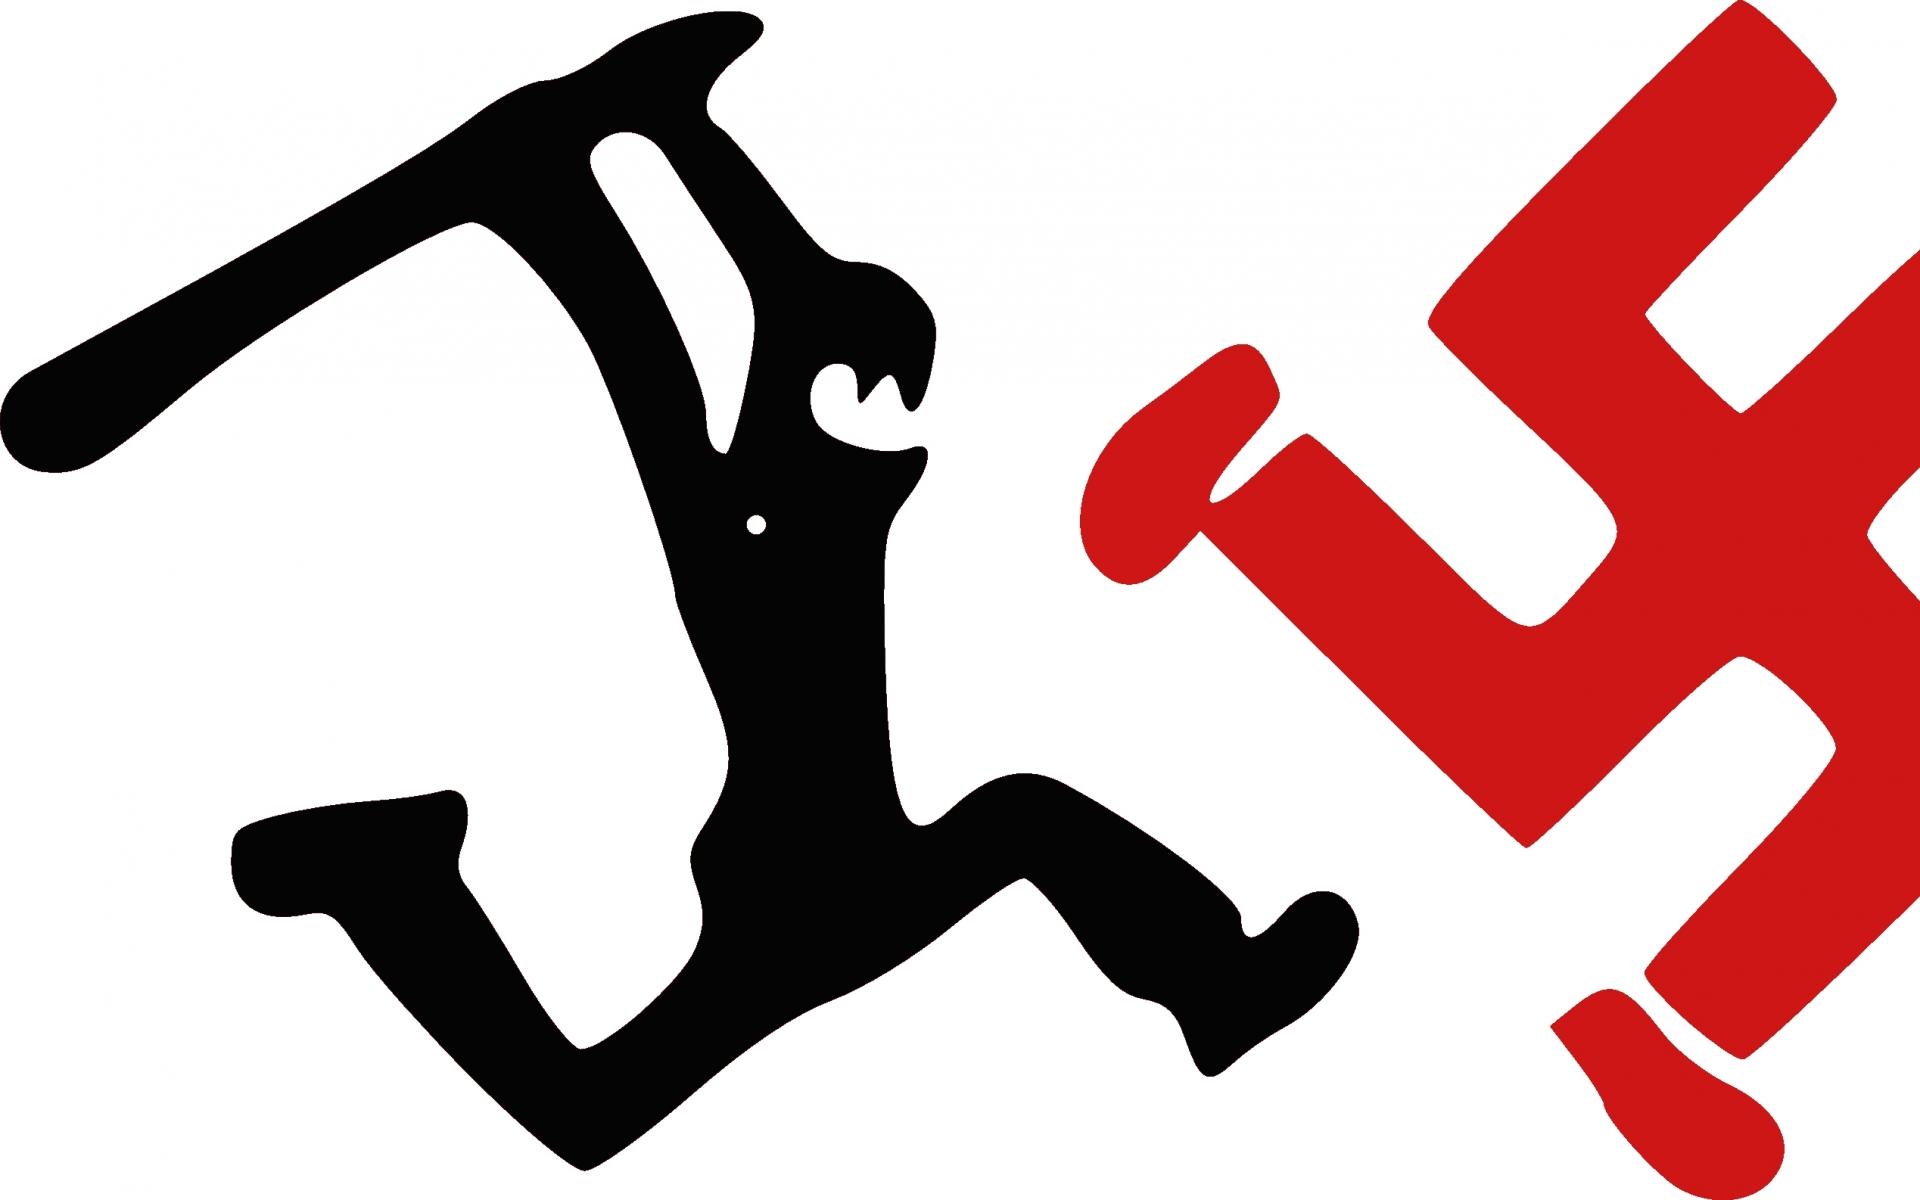 swastika racism antifa - photo #1